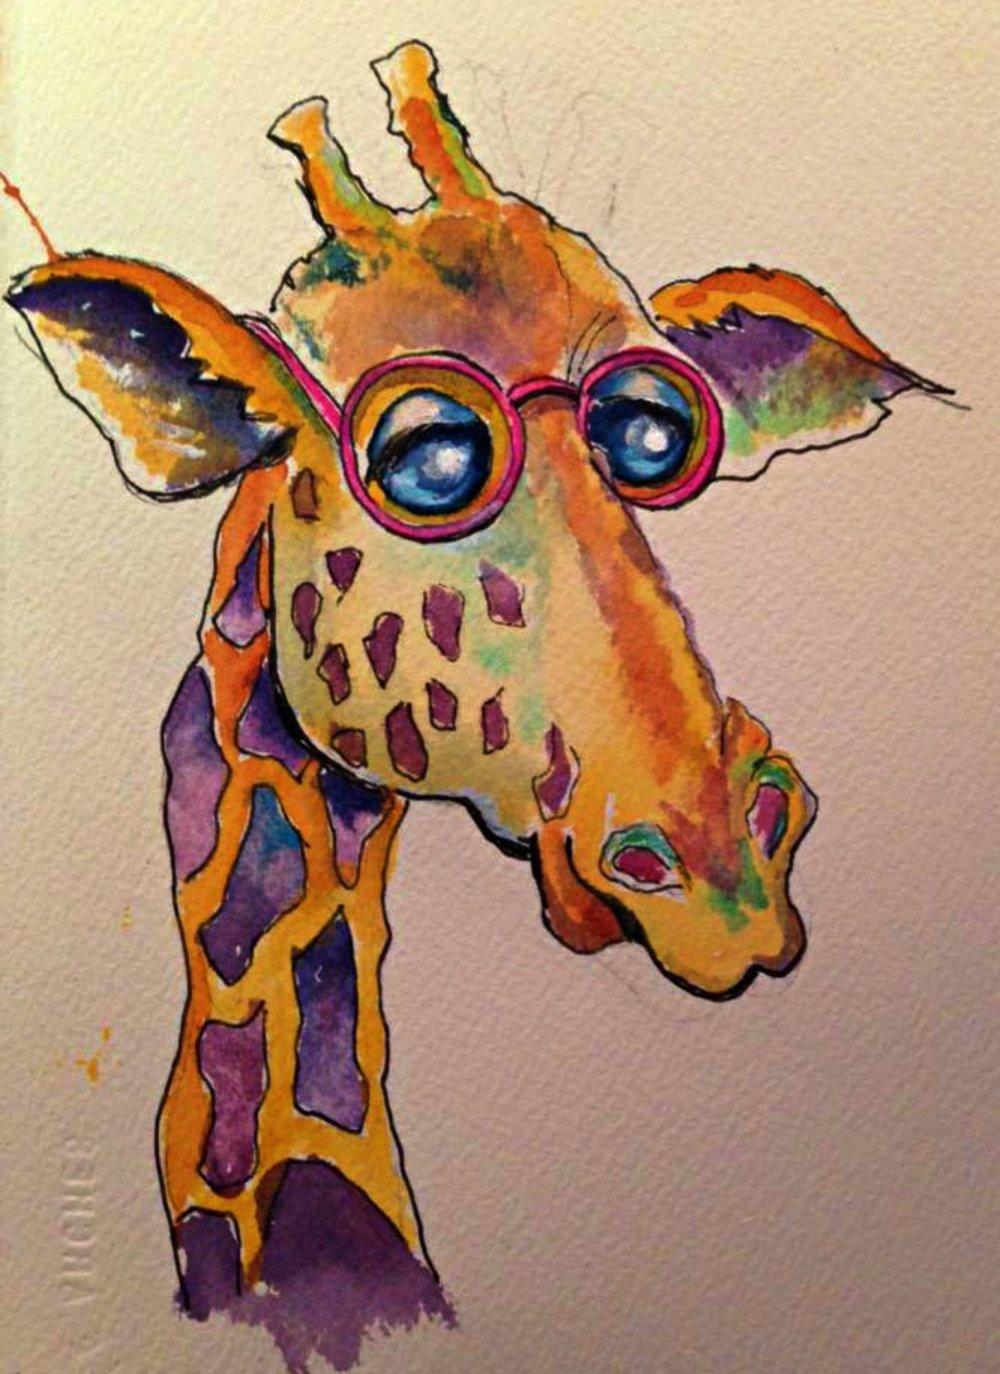 Silly_Giraffe copy.jpg